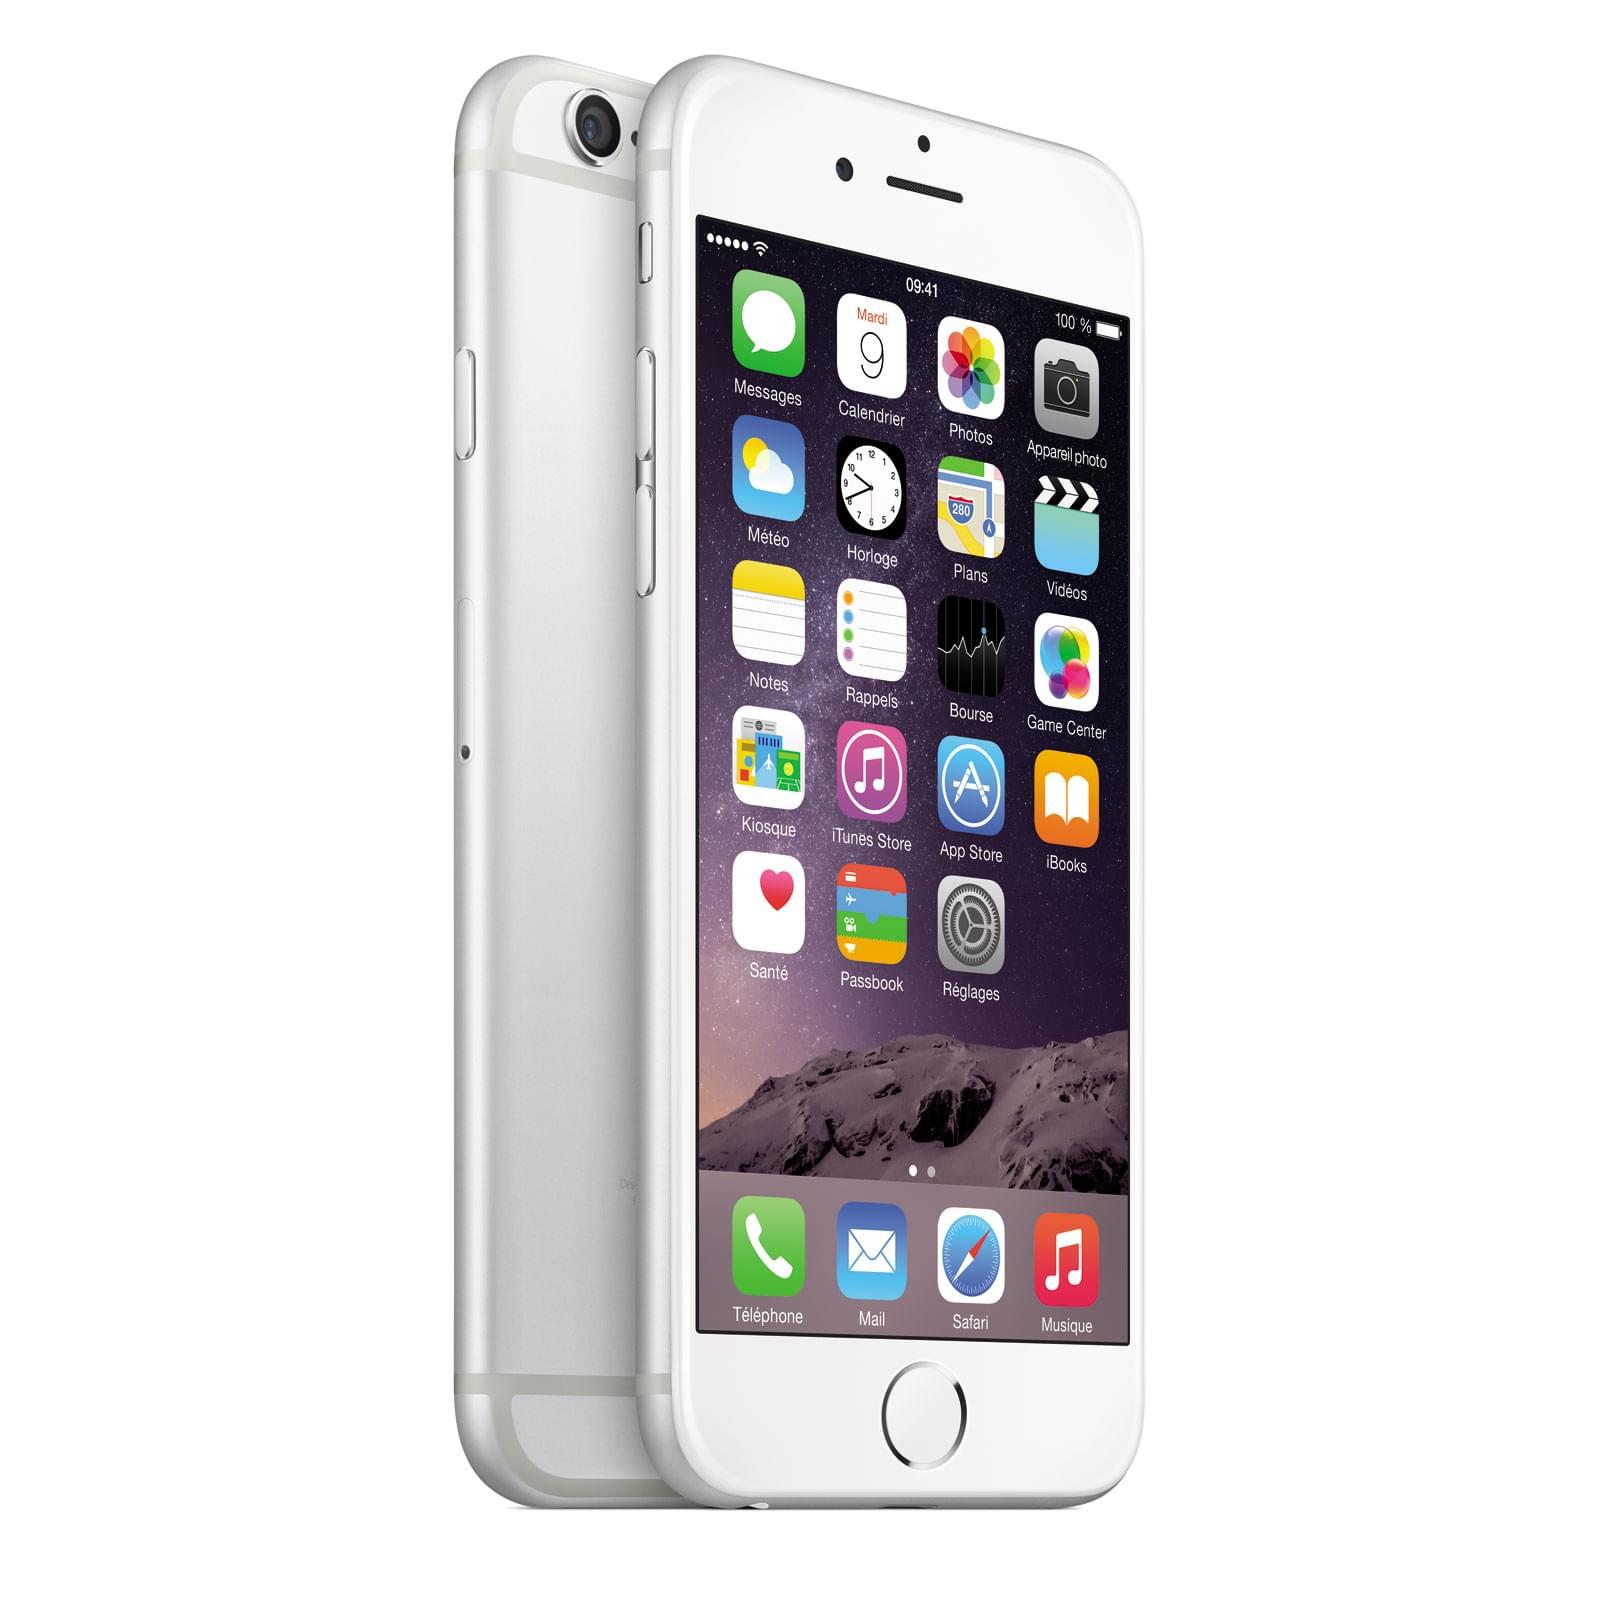 Apple iPhone 6 64Go Argent - Téléphonie Apple - Cybertek.fr - 0